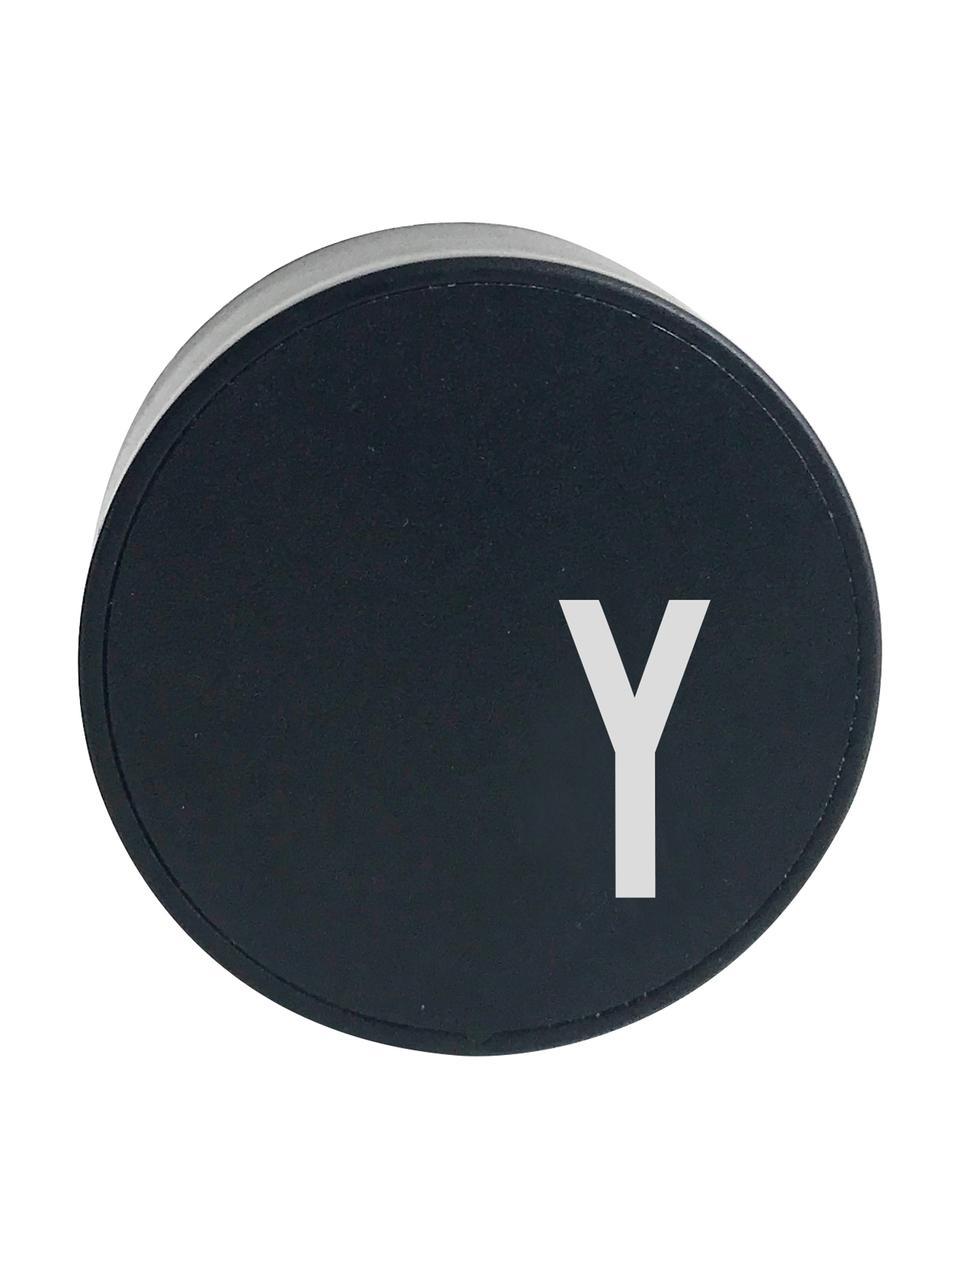 Caricabatterie MyCharger (varianti dalla A alla Z), Materiale sintetico, Nero, Caricabatterie Y